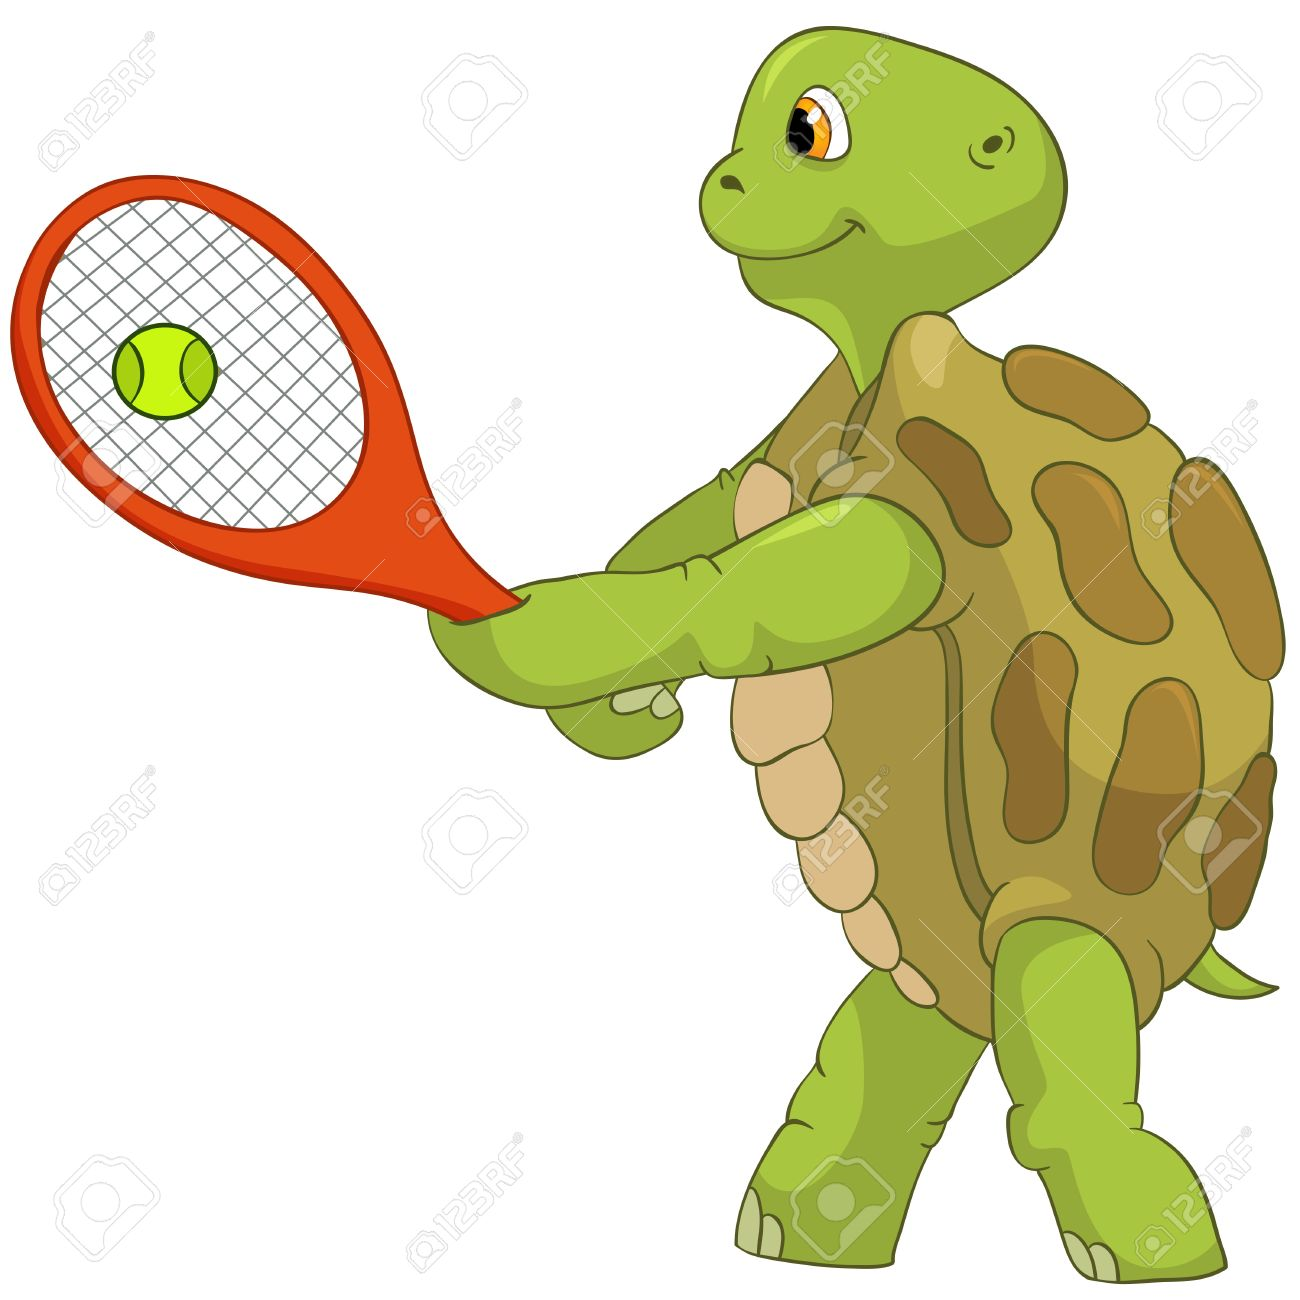 Tennis ball mascot stock photos tennis ball mascot stock photography - Tennis Ball Mascot Funny Turtle Tennis Player Stock Photo